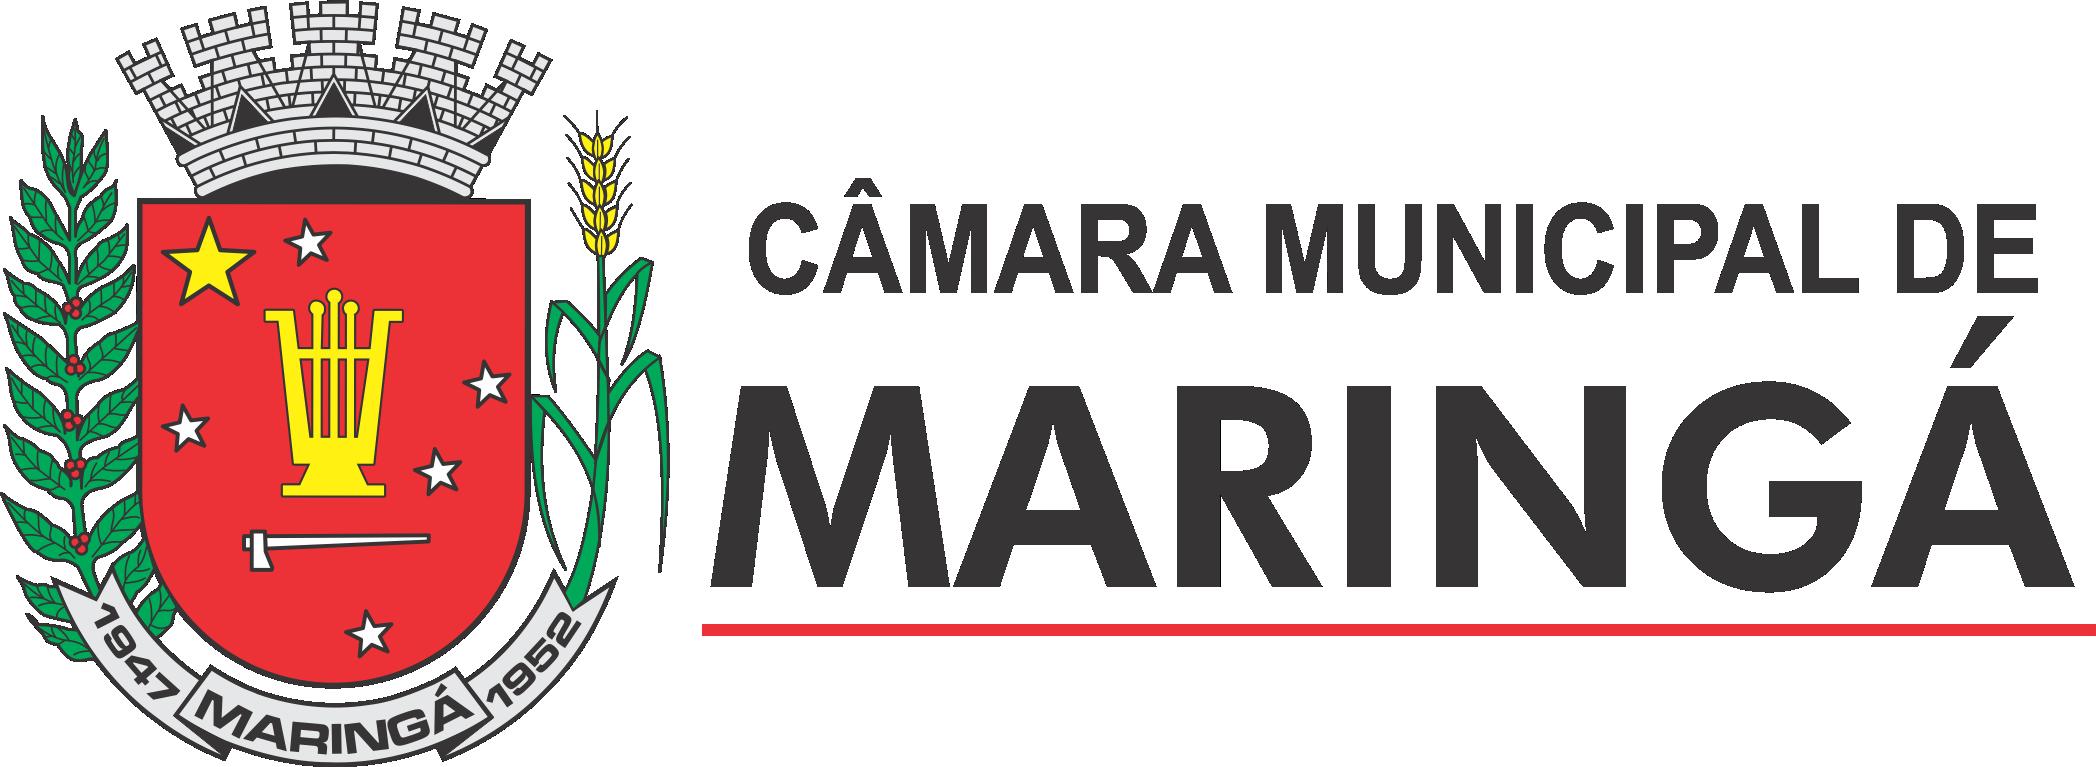 Camara Maringa